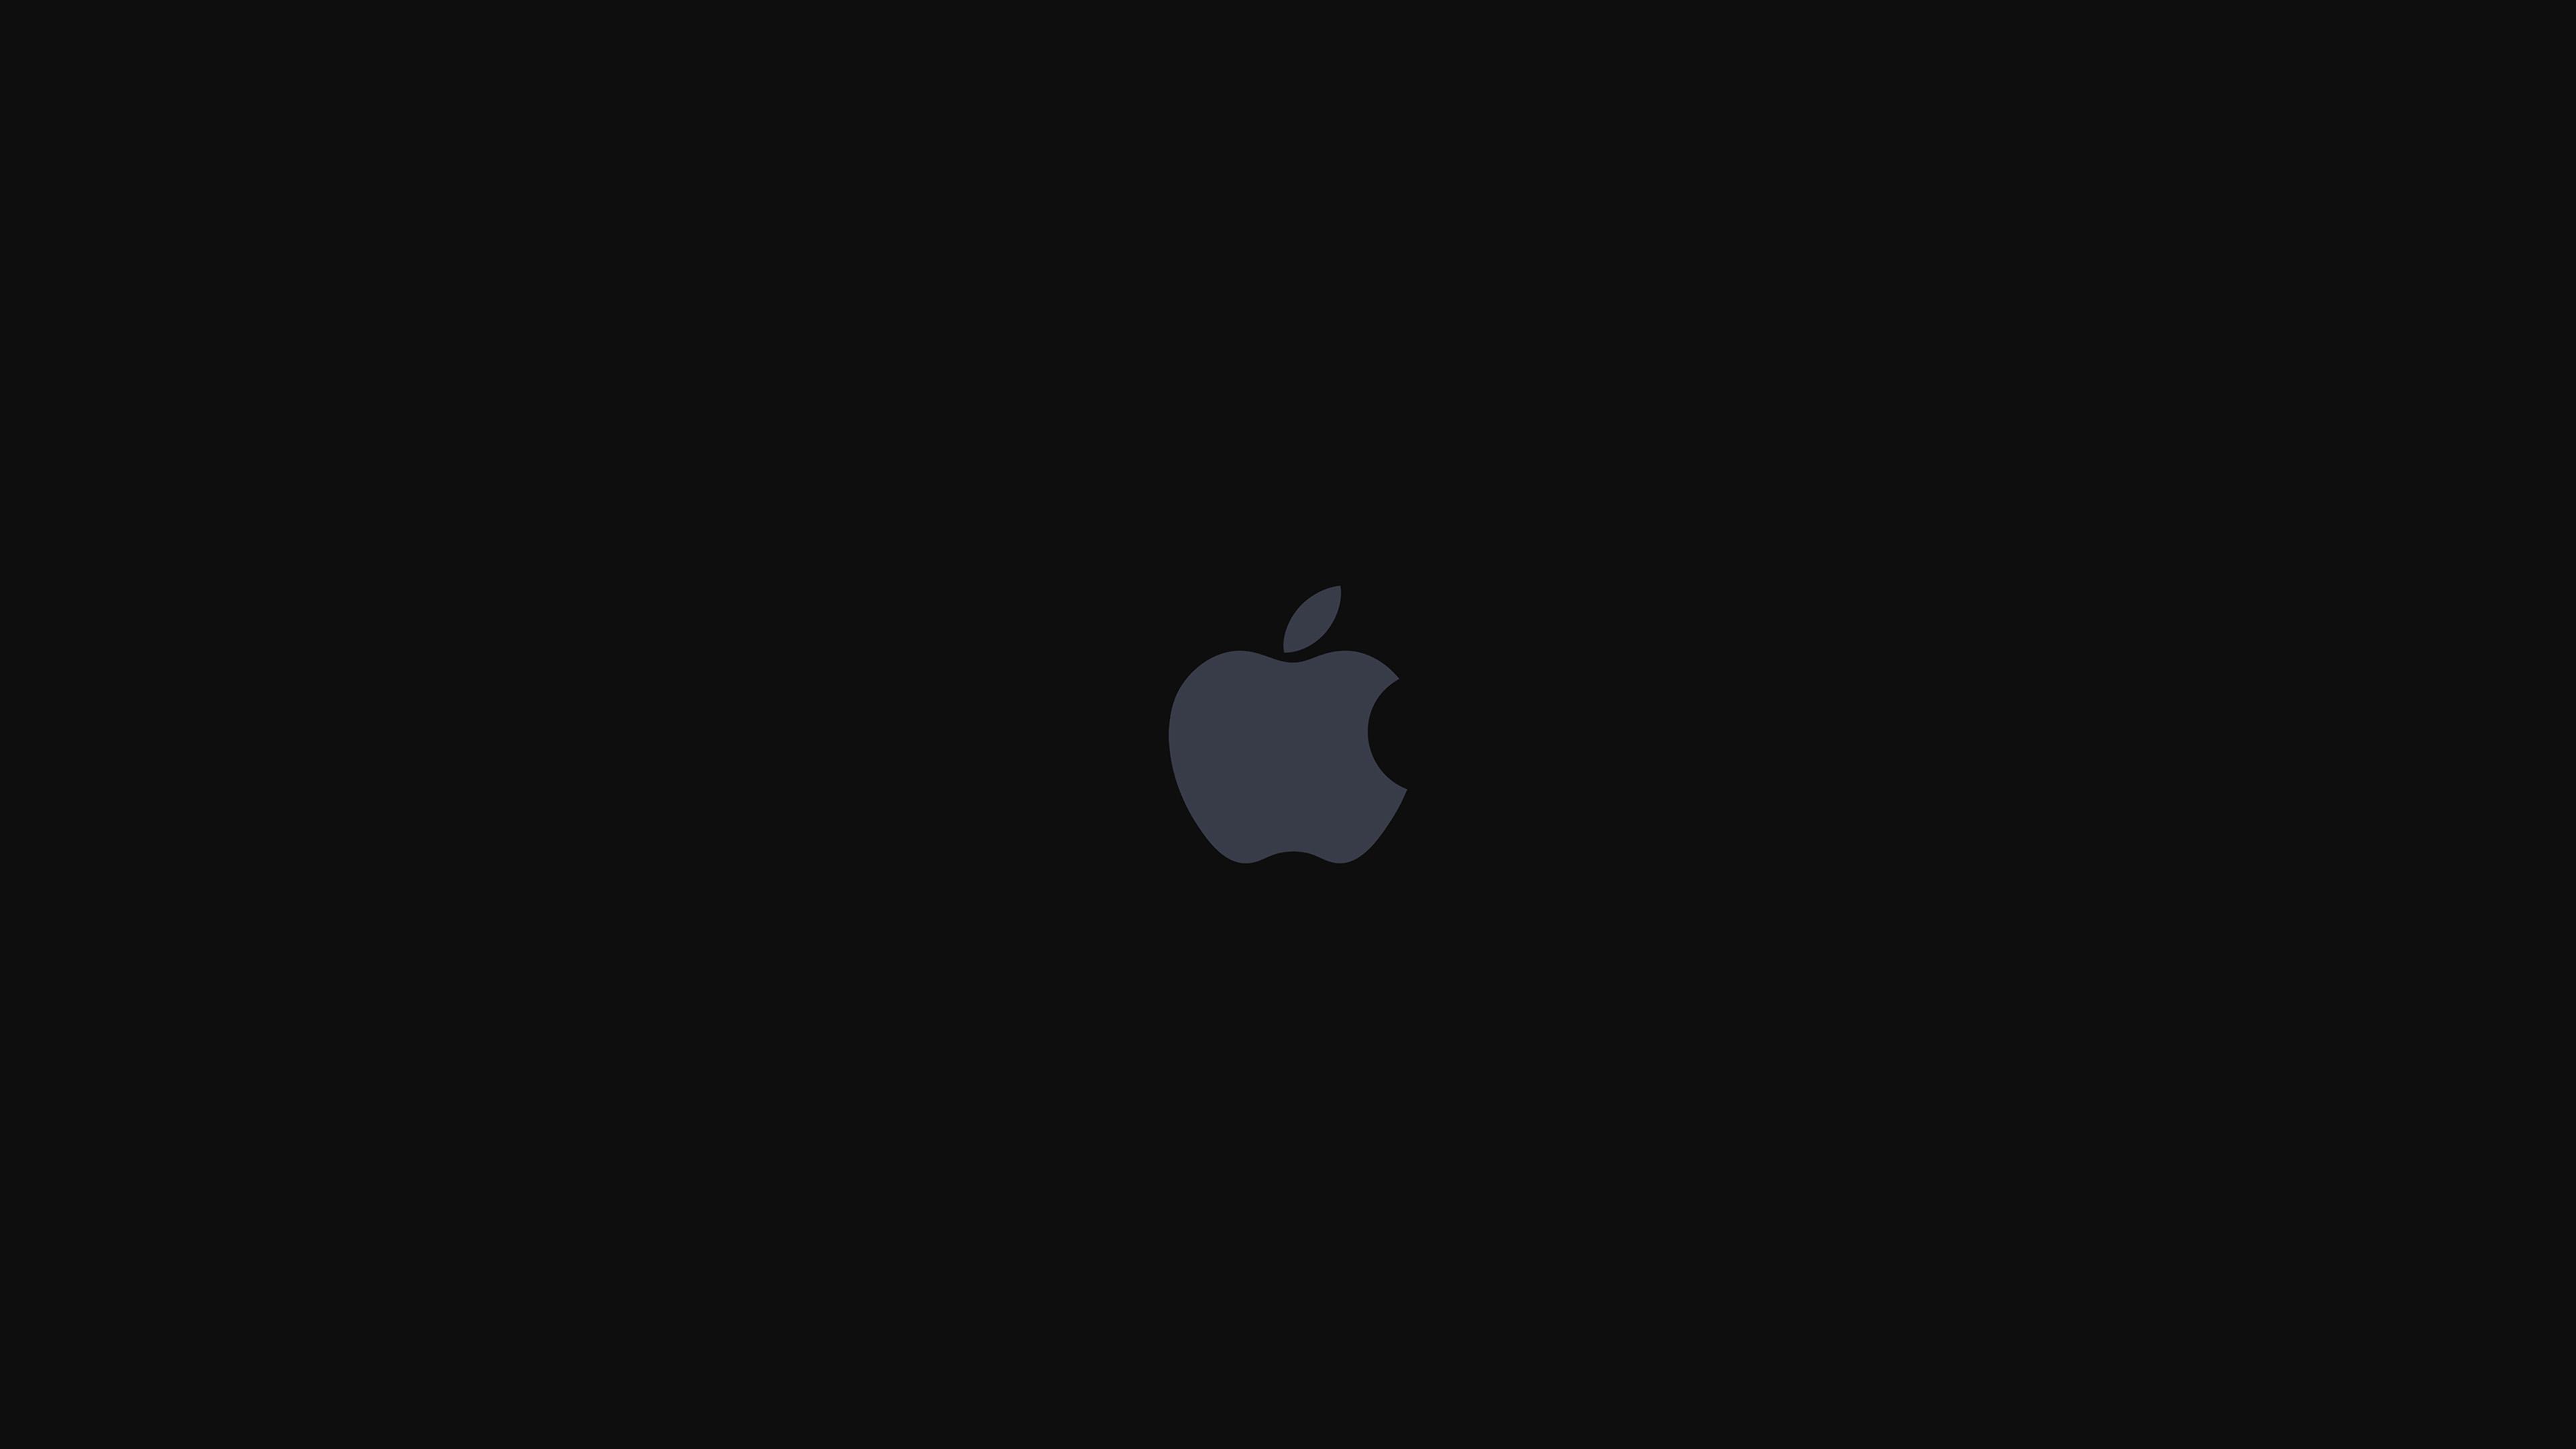 as68-iphone7-apple-logo-dark-art-illustration-wallpaper